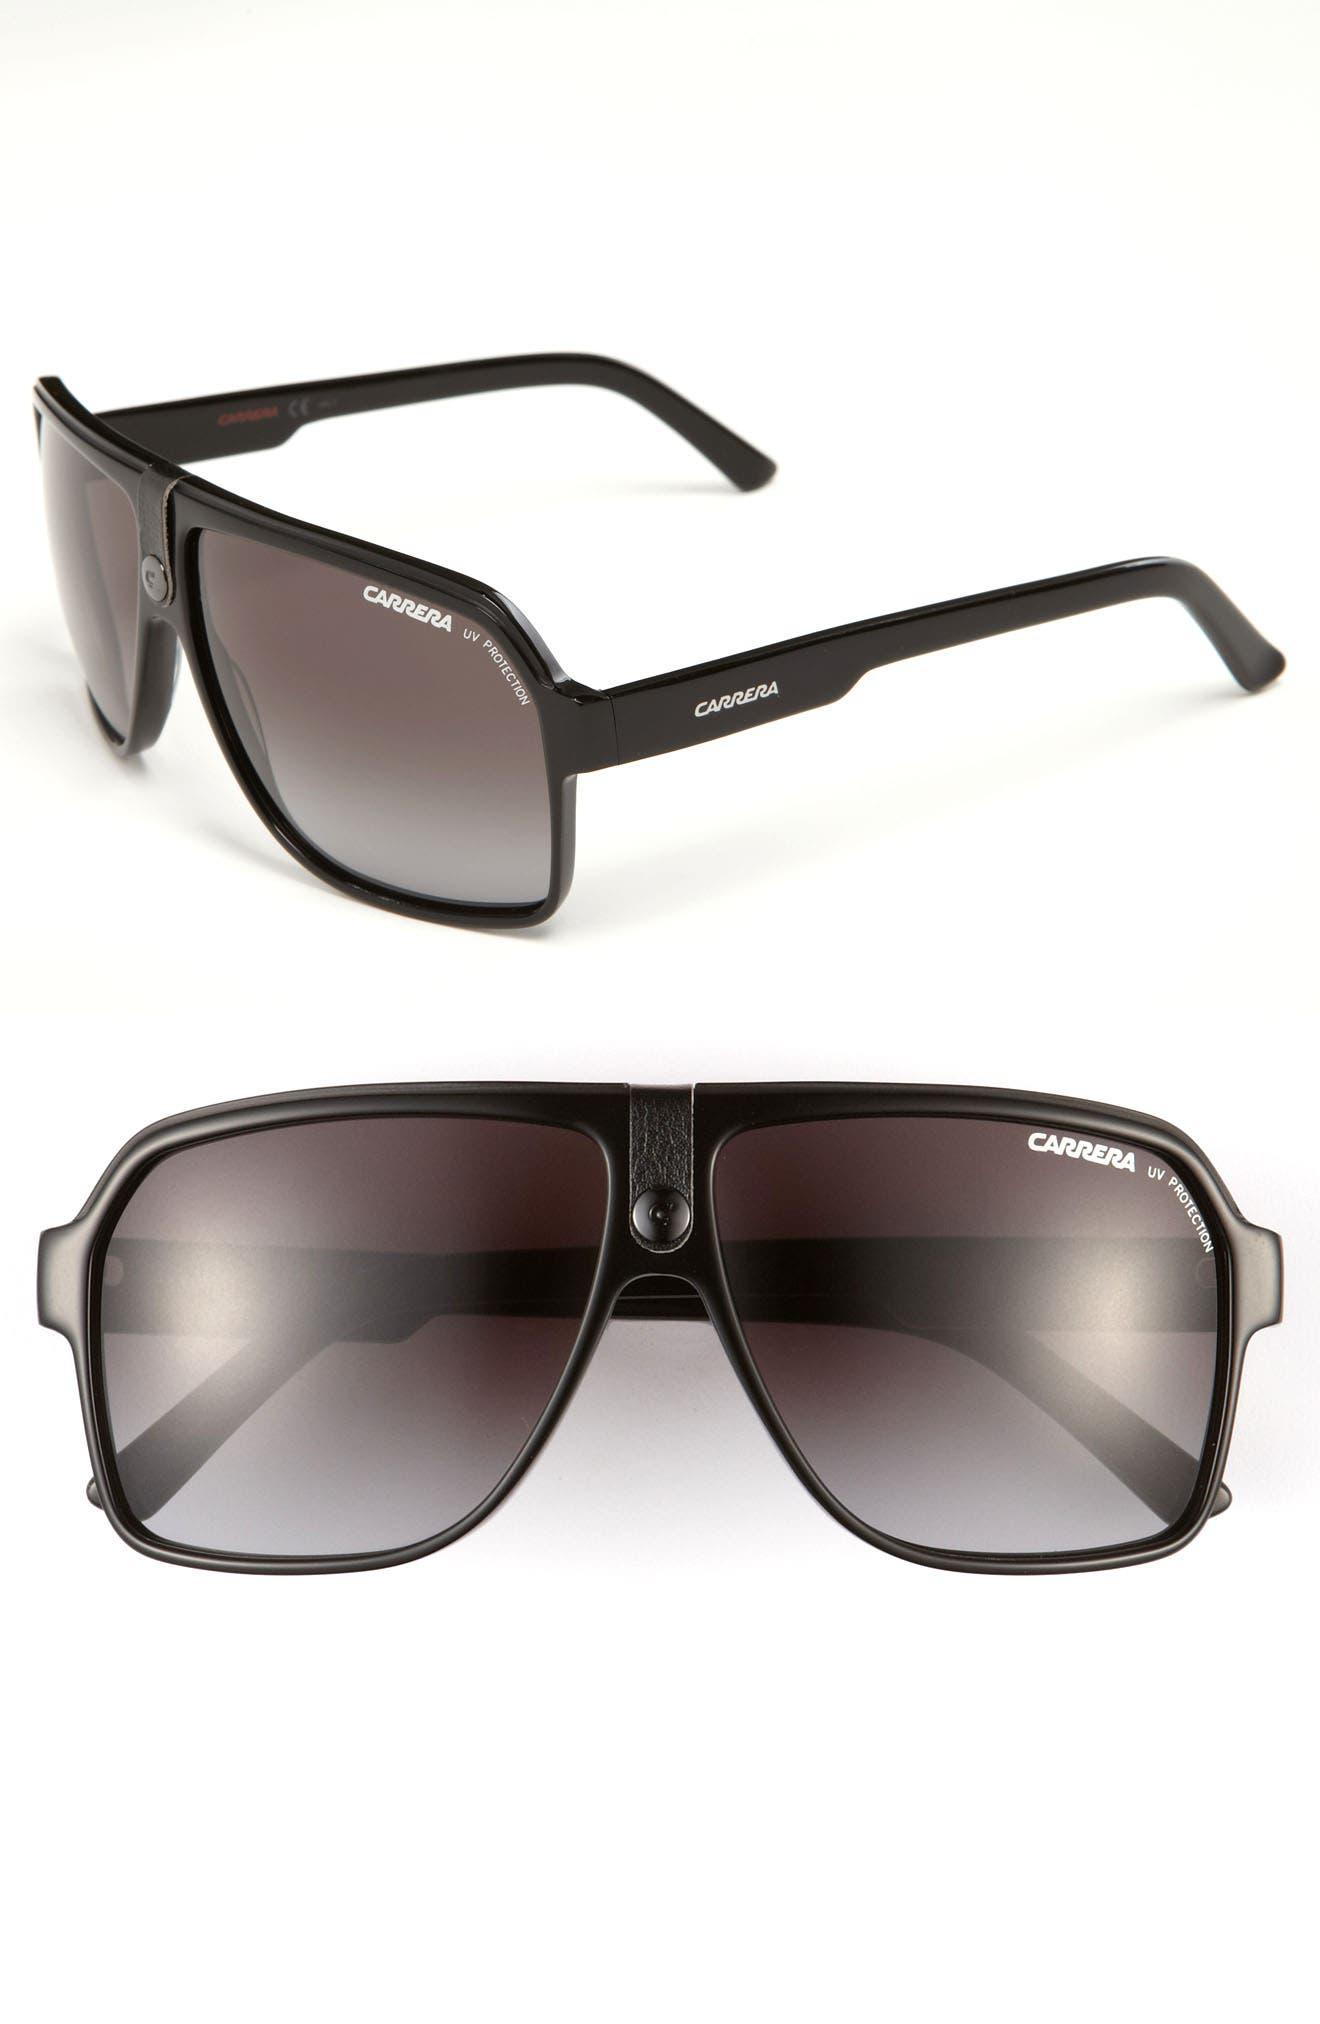 62mm Aviator Sunglasses, Main, color, BLACK